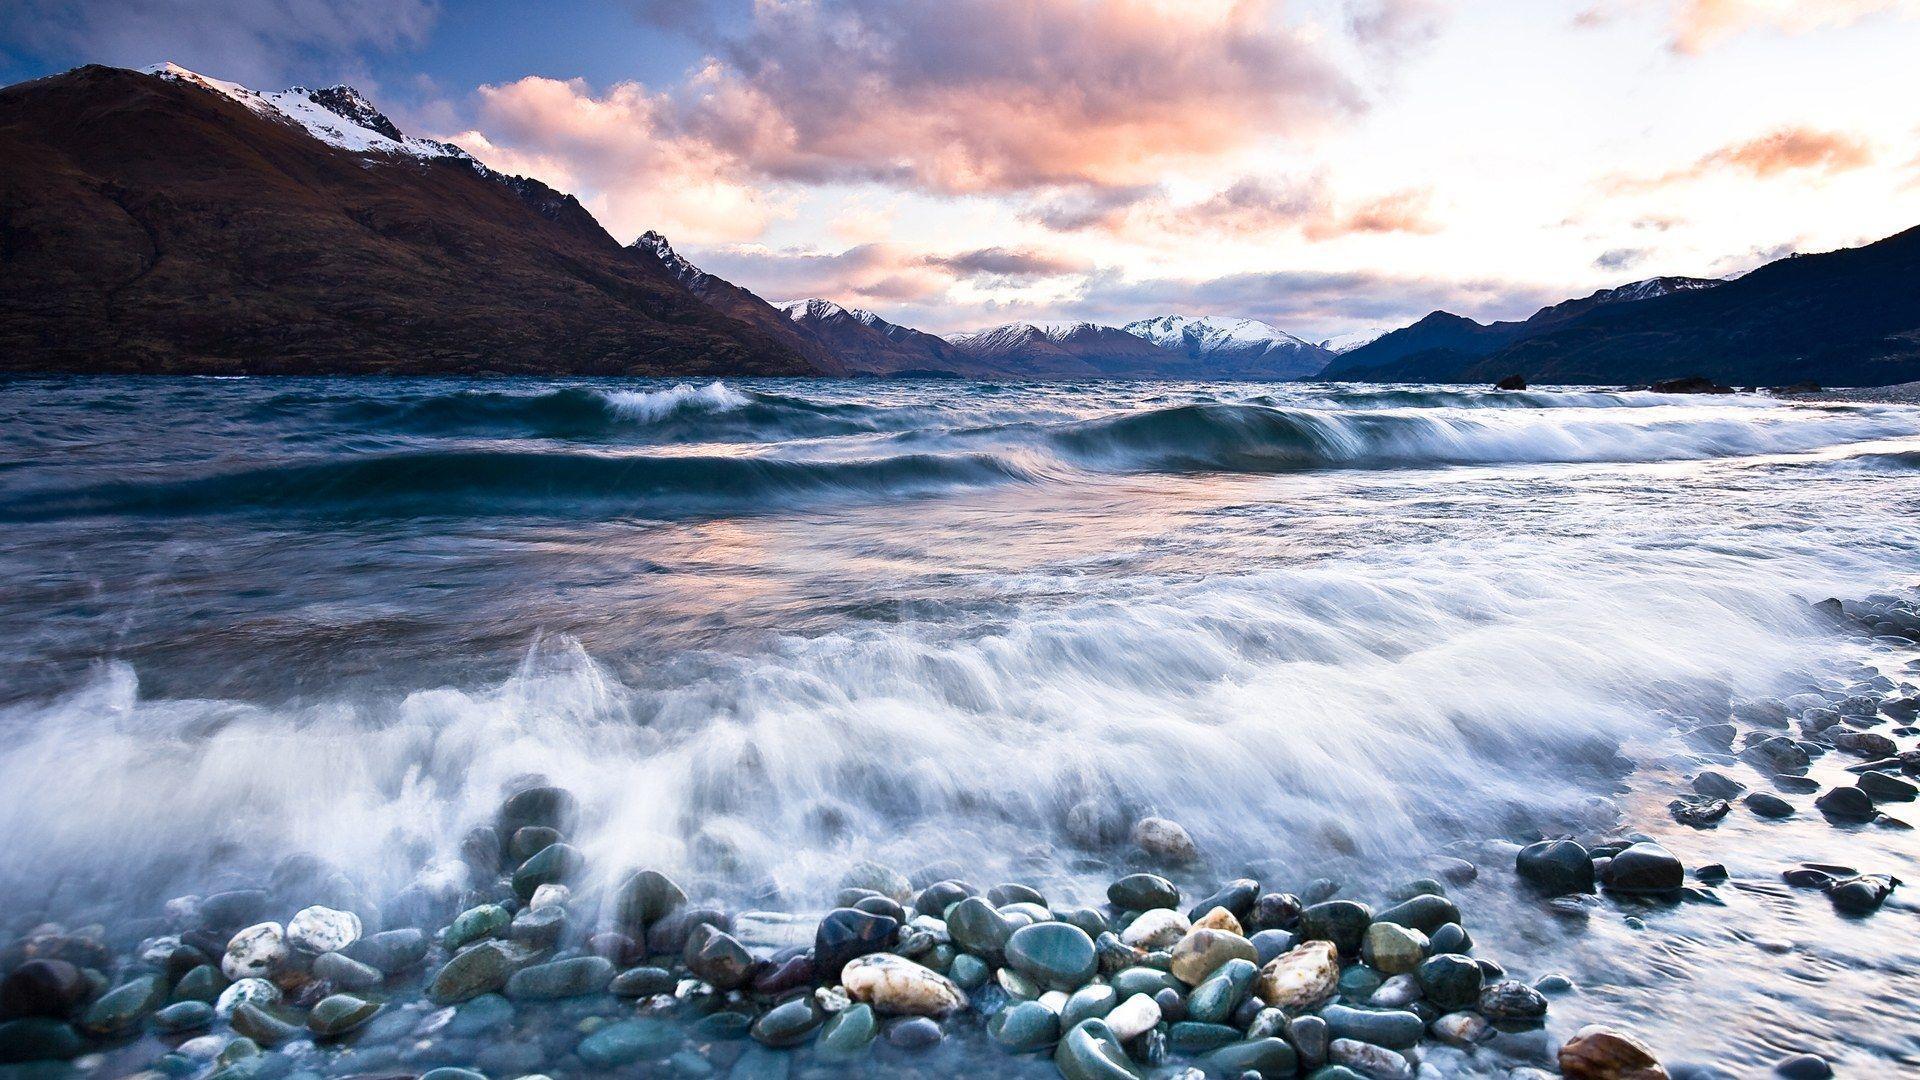 Pelaku Penembakan New Zealand Wallpaper: New Zealand Wallpapers